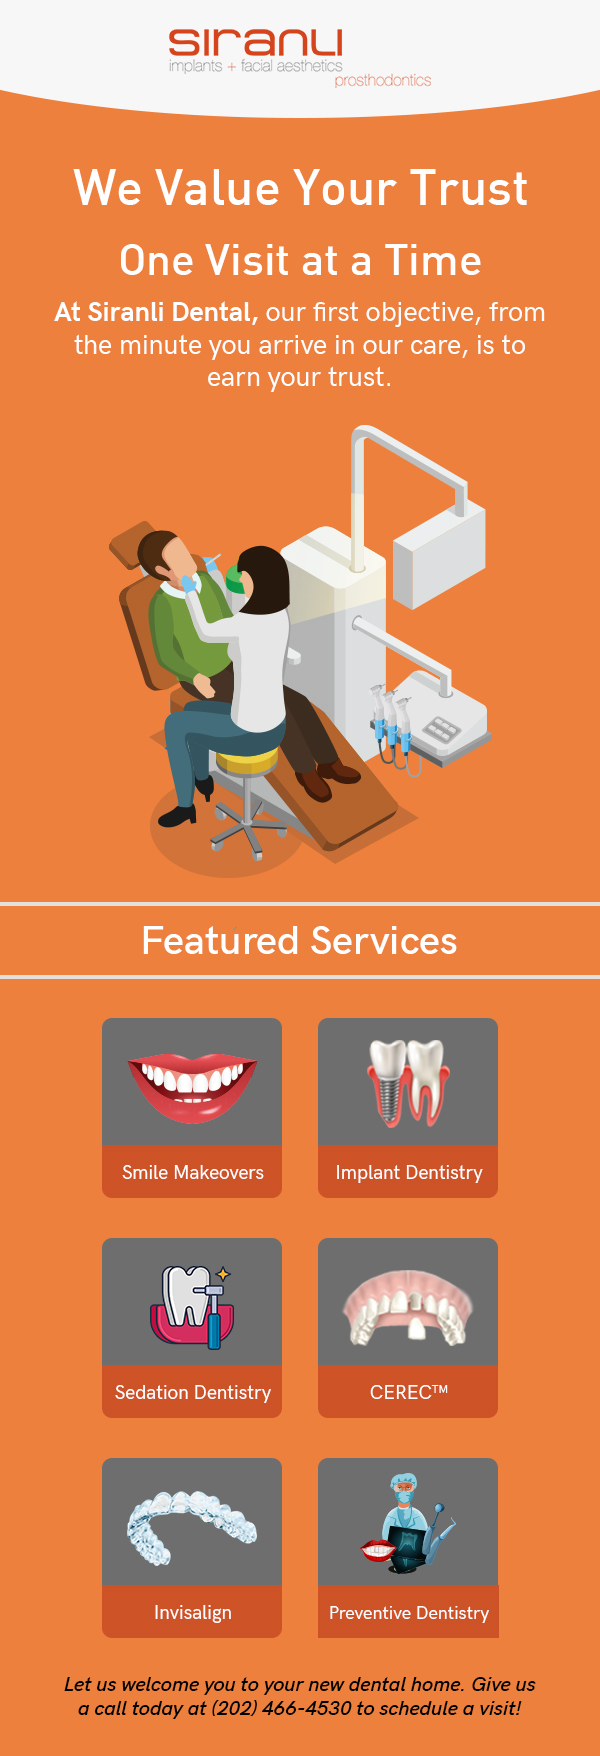 Siranli Implants & Facial Aesthetics – A Trusted Dental Practice in Washington, DC